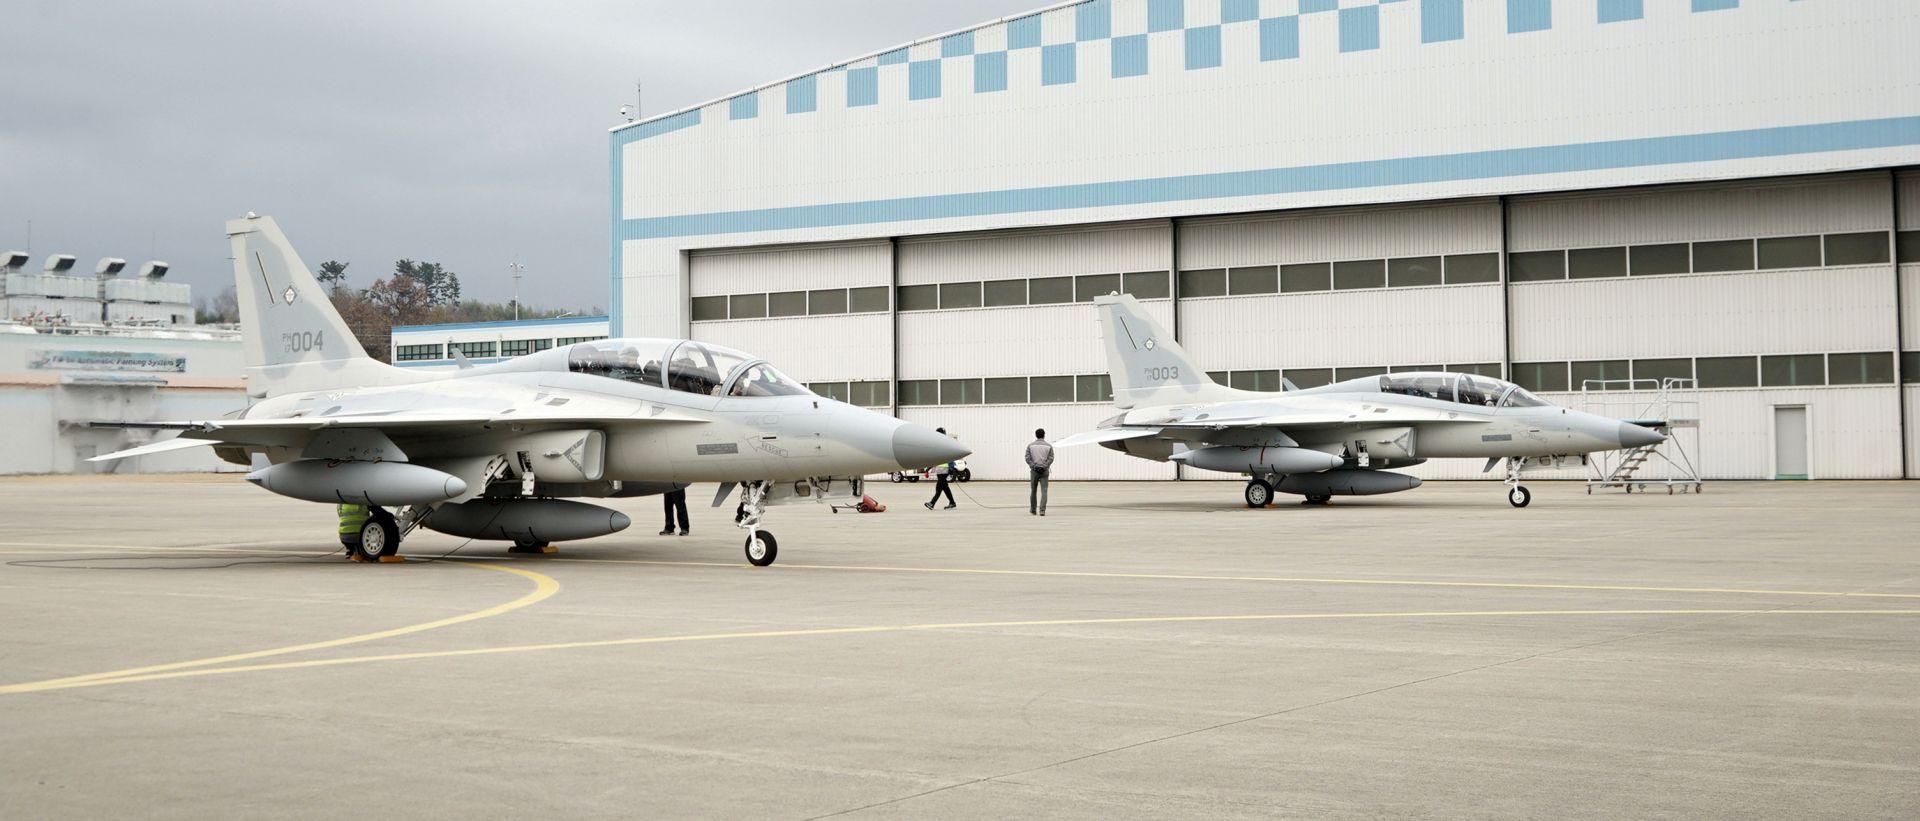 Južnokorejski KAI: FA-50 je pravi odabir za HRZ